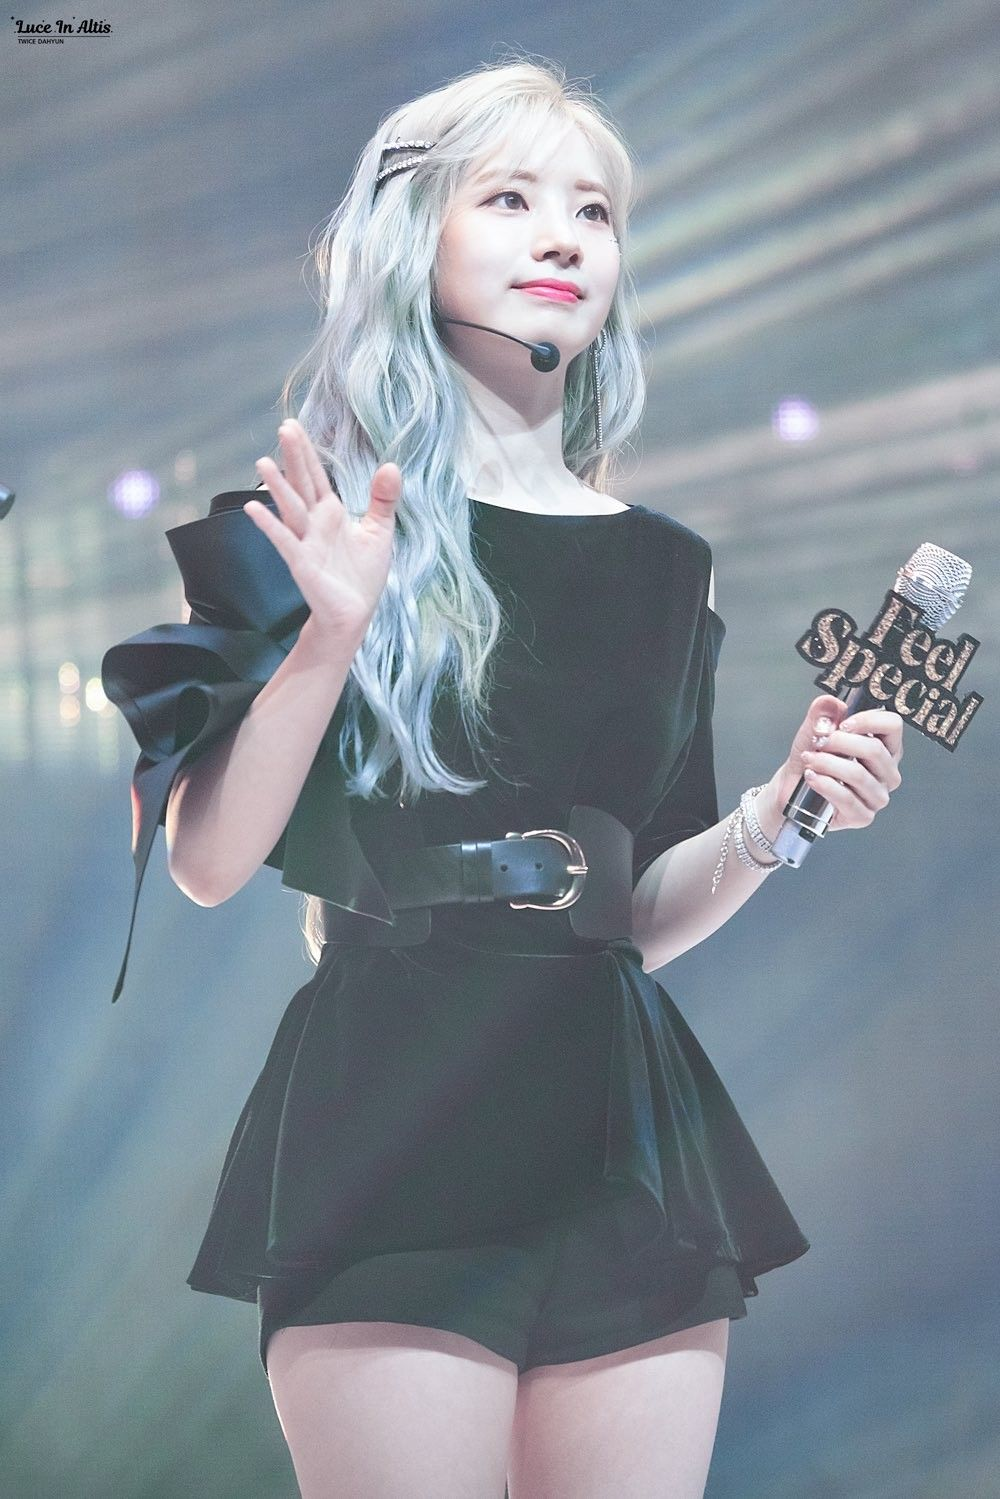 Dahyun Feel Special Outfit : dahyun, special, outfit, 190923, TWICE, 'Feel, Special', Showcase, #Dahyun, #Twice, ダヒョン,, Kポップ,, トゥワイス